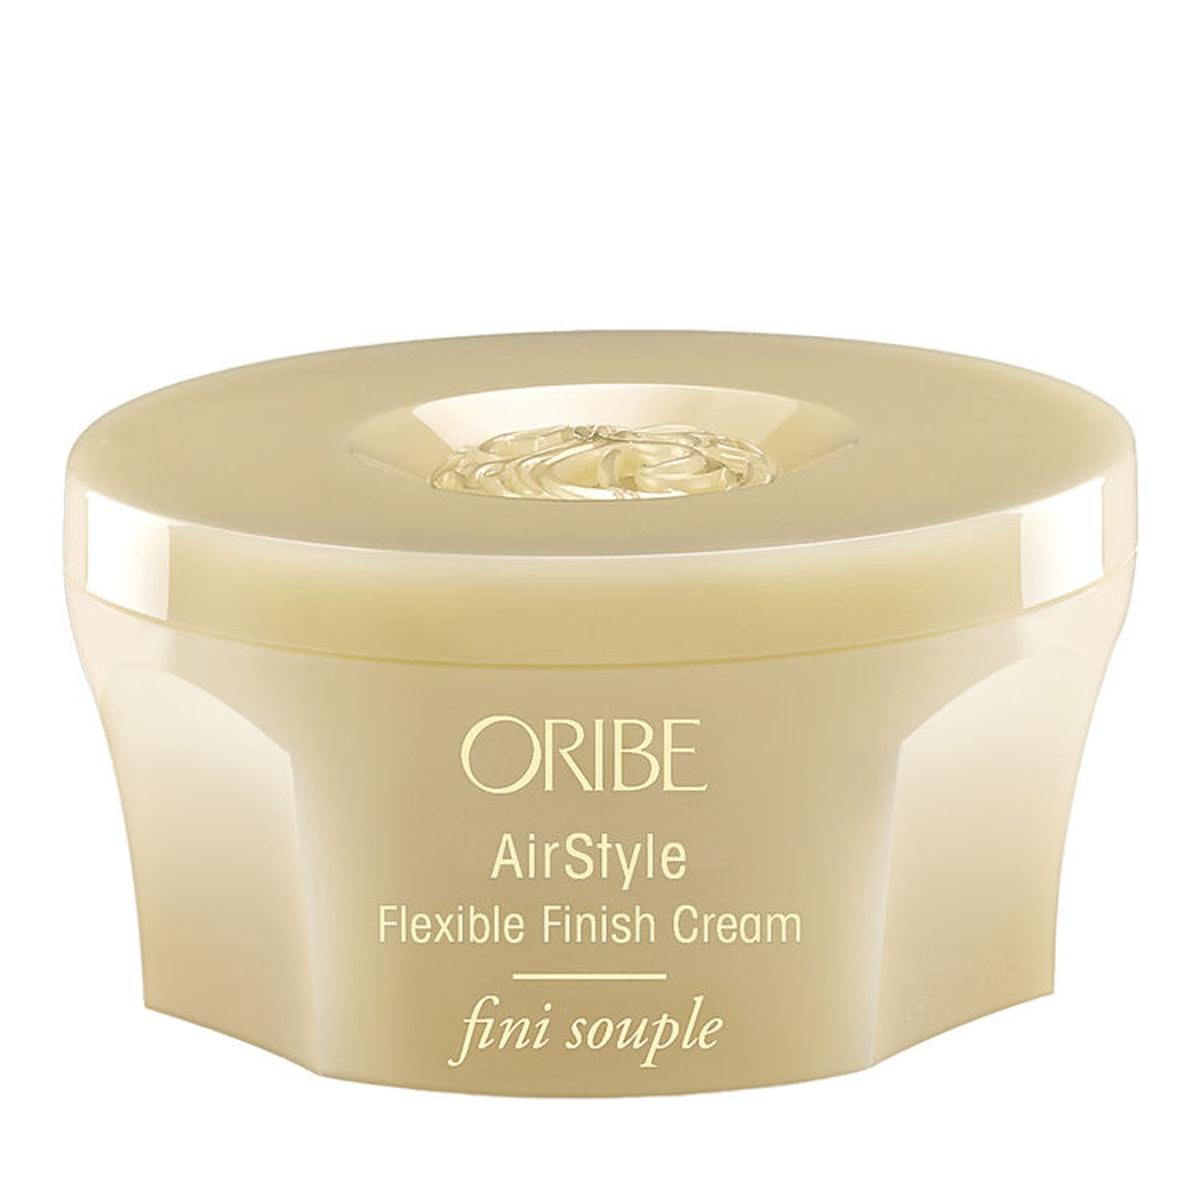 Airstyle Flexible Finish Cream